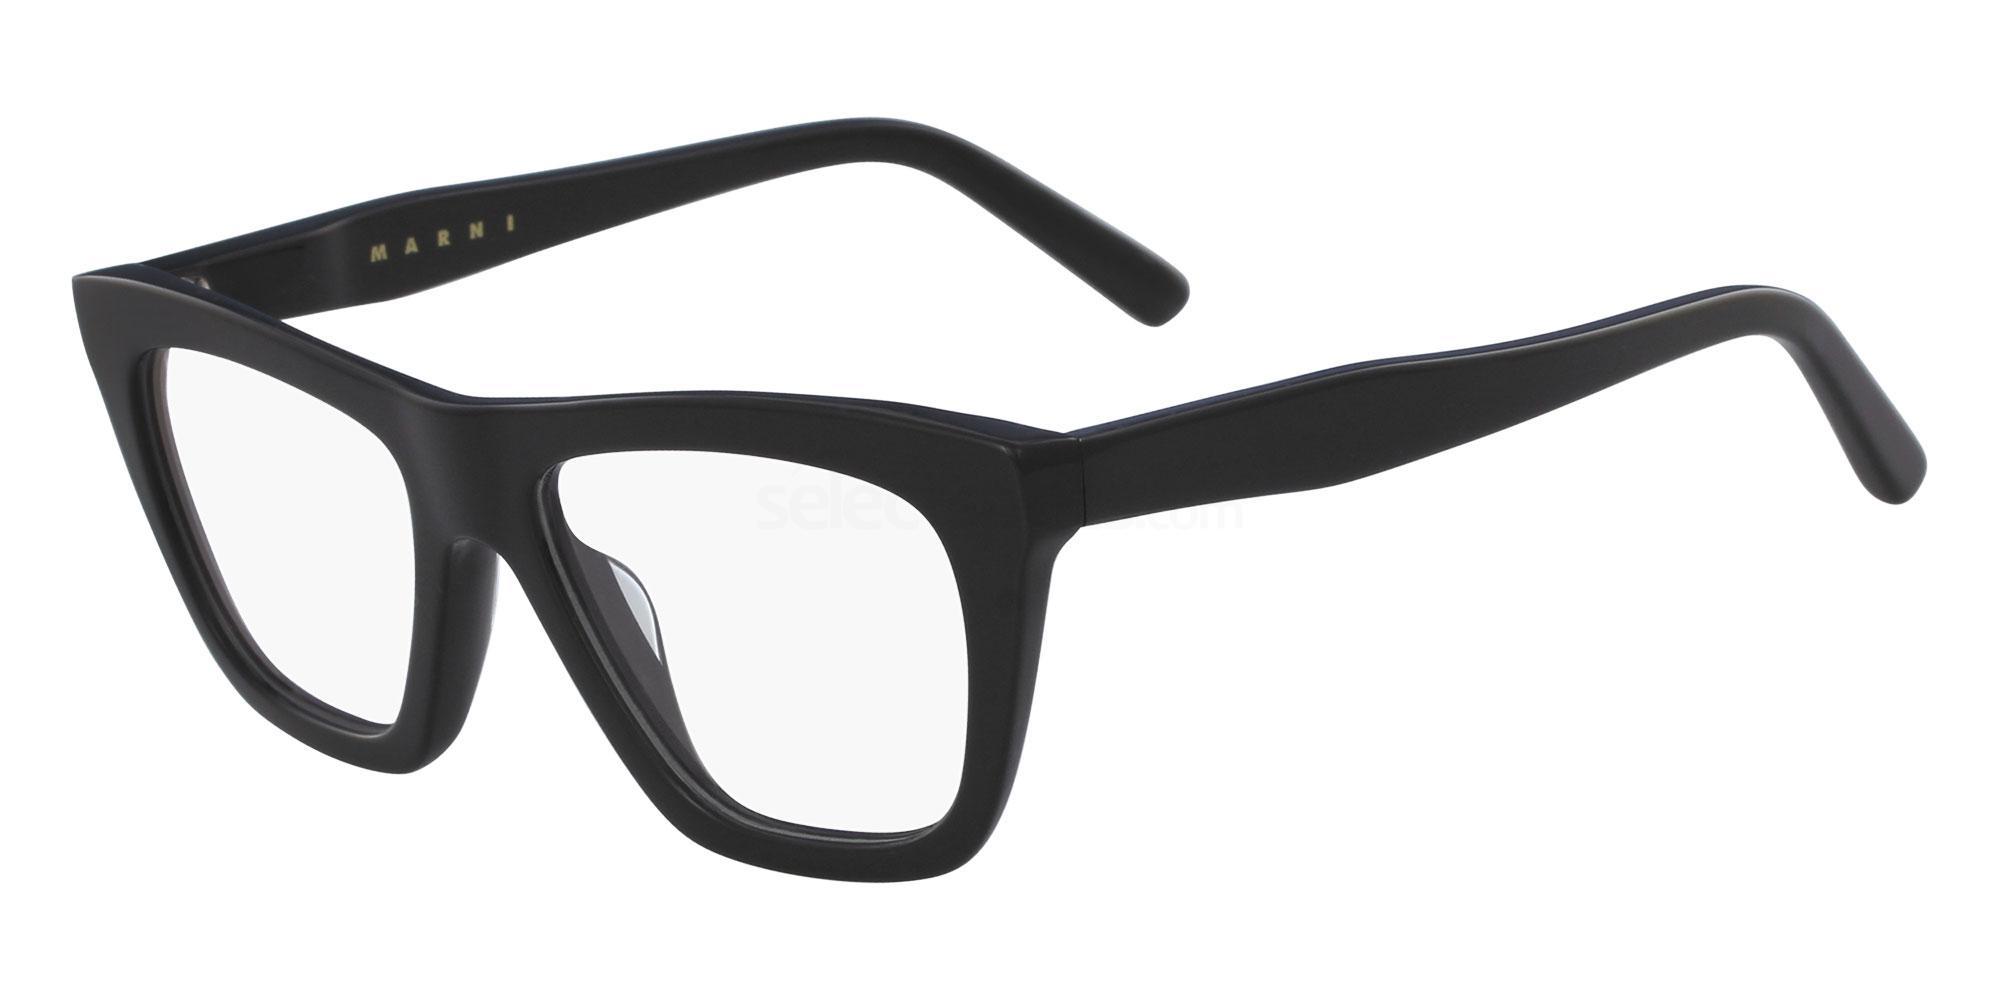 001 ME2619 Glasses, Marni